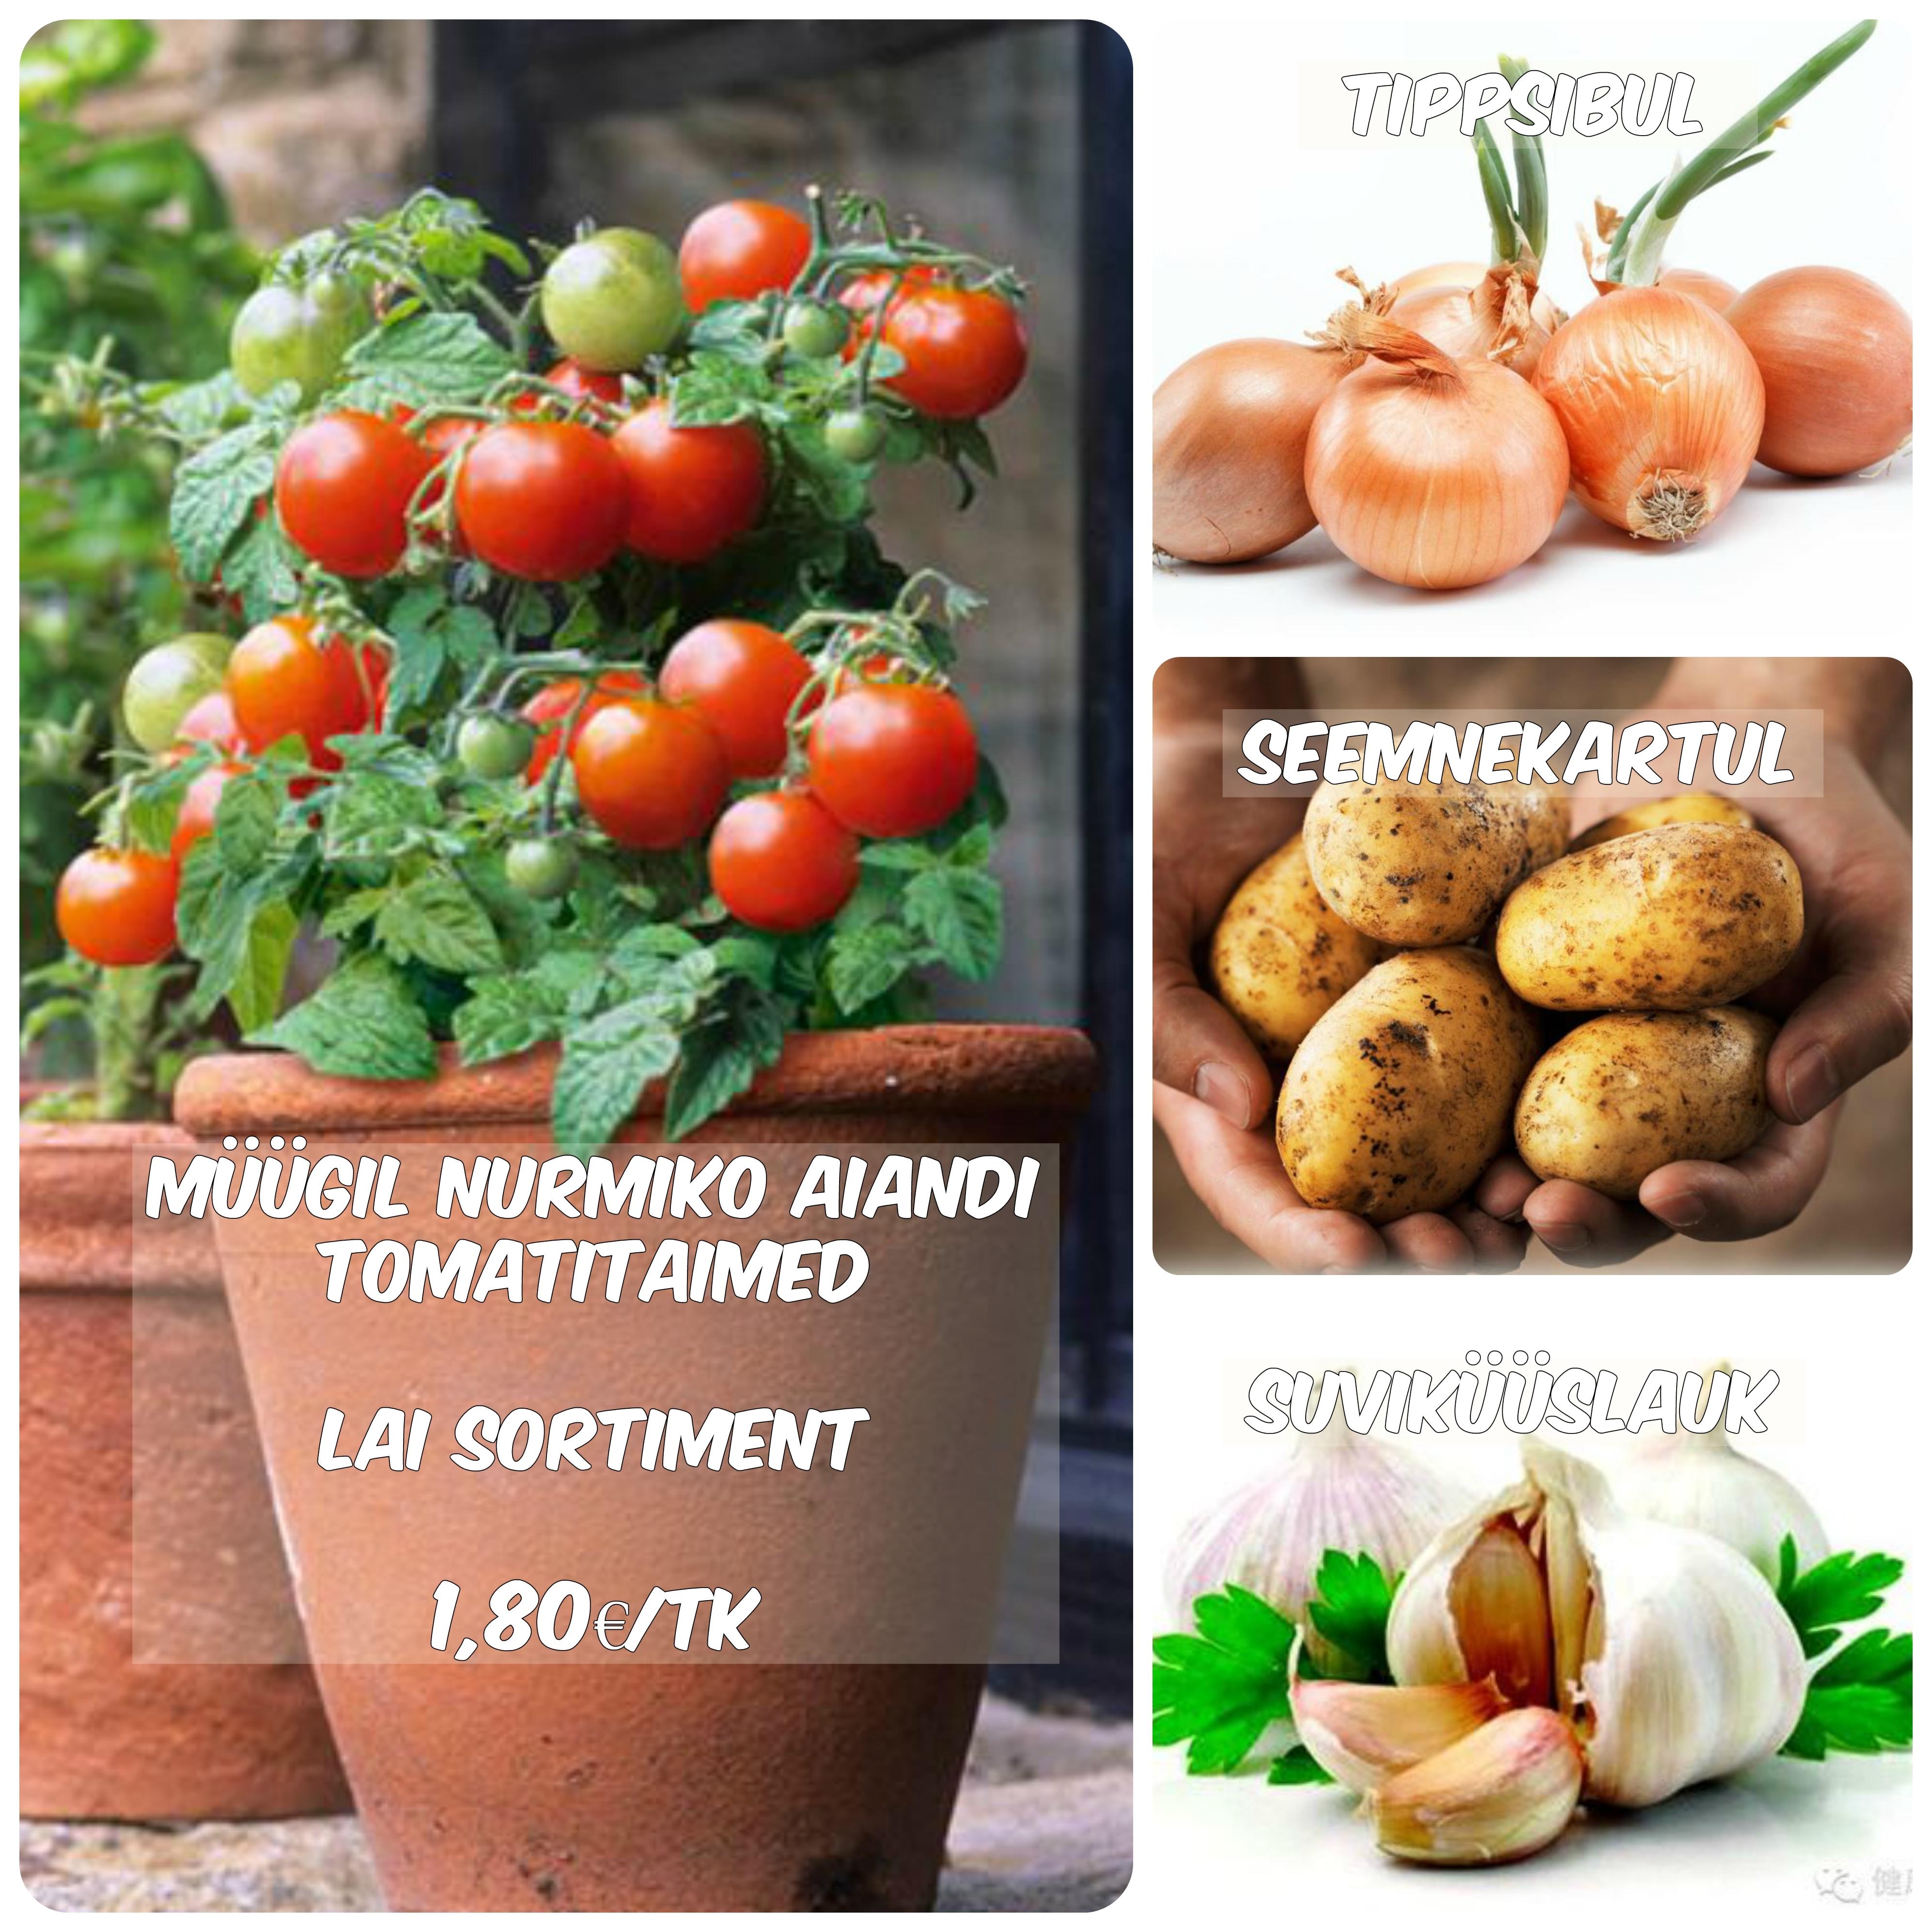 tomatitaimed.jpg